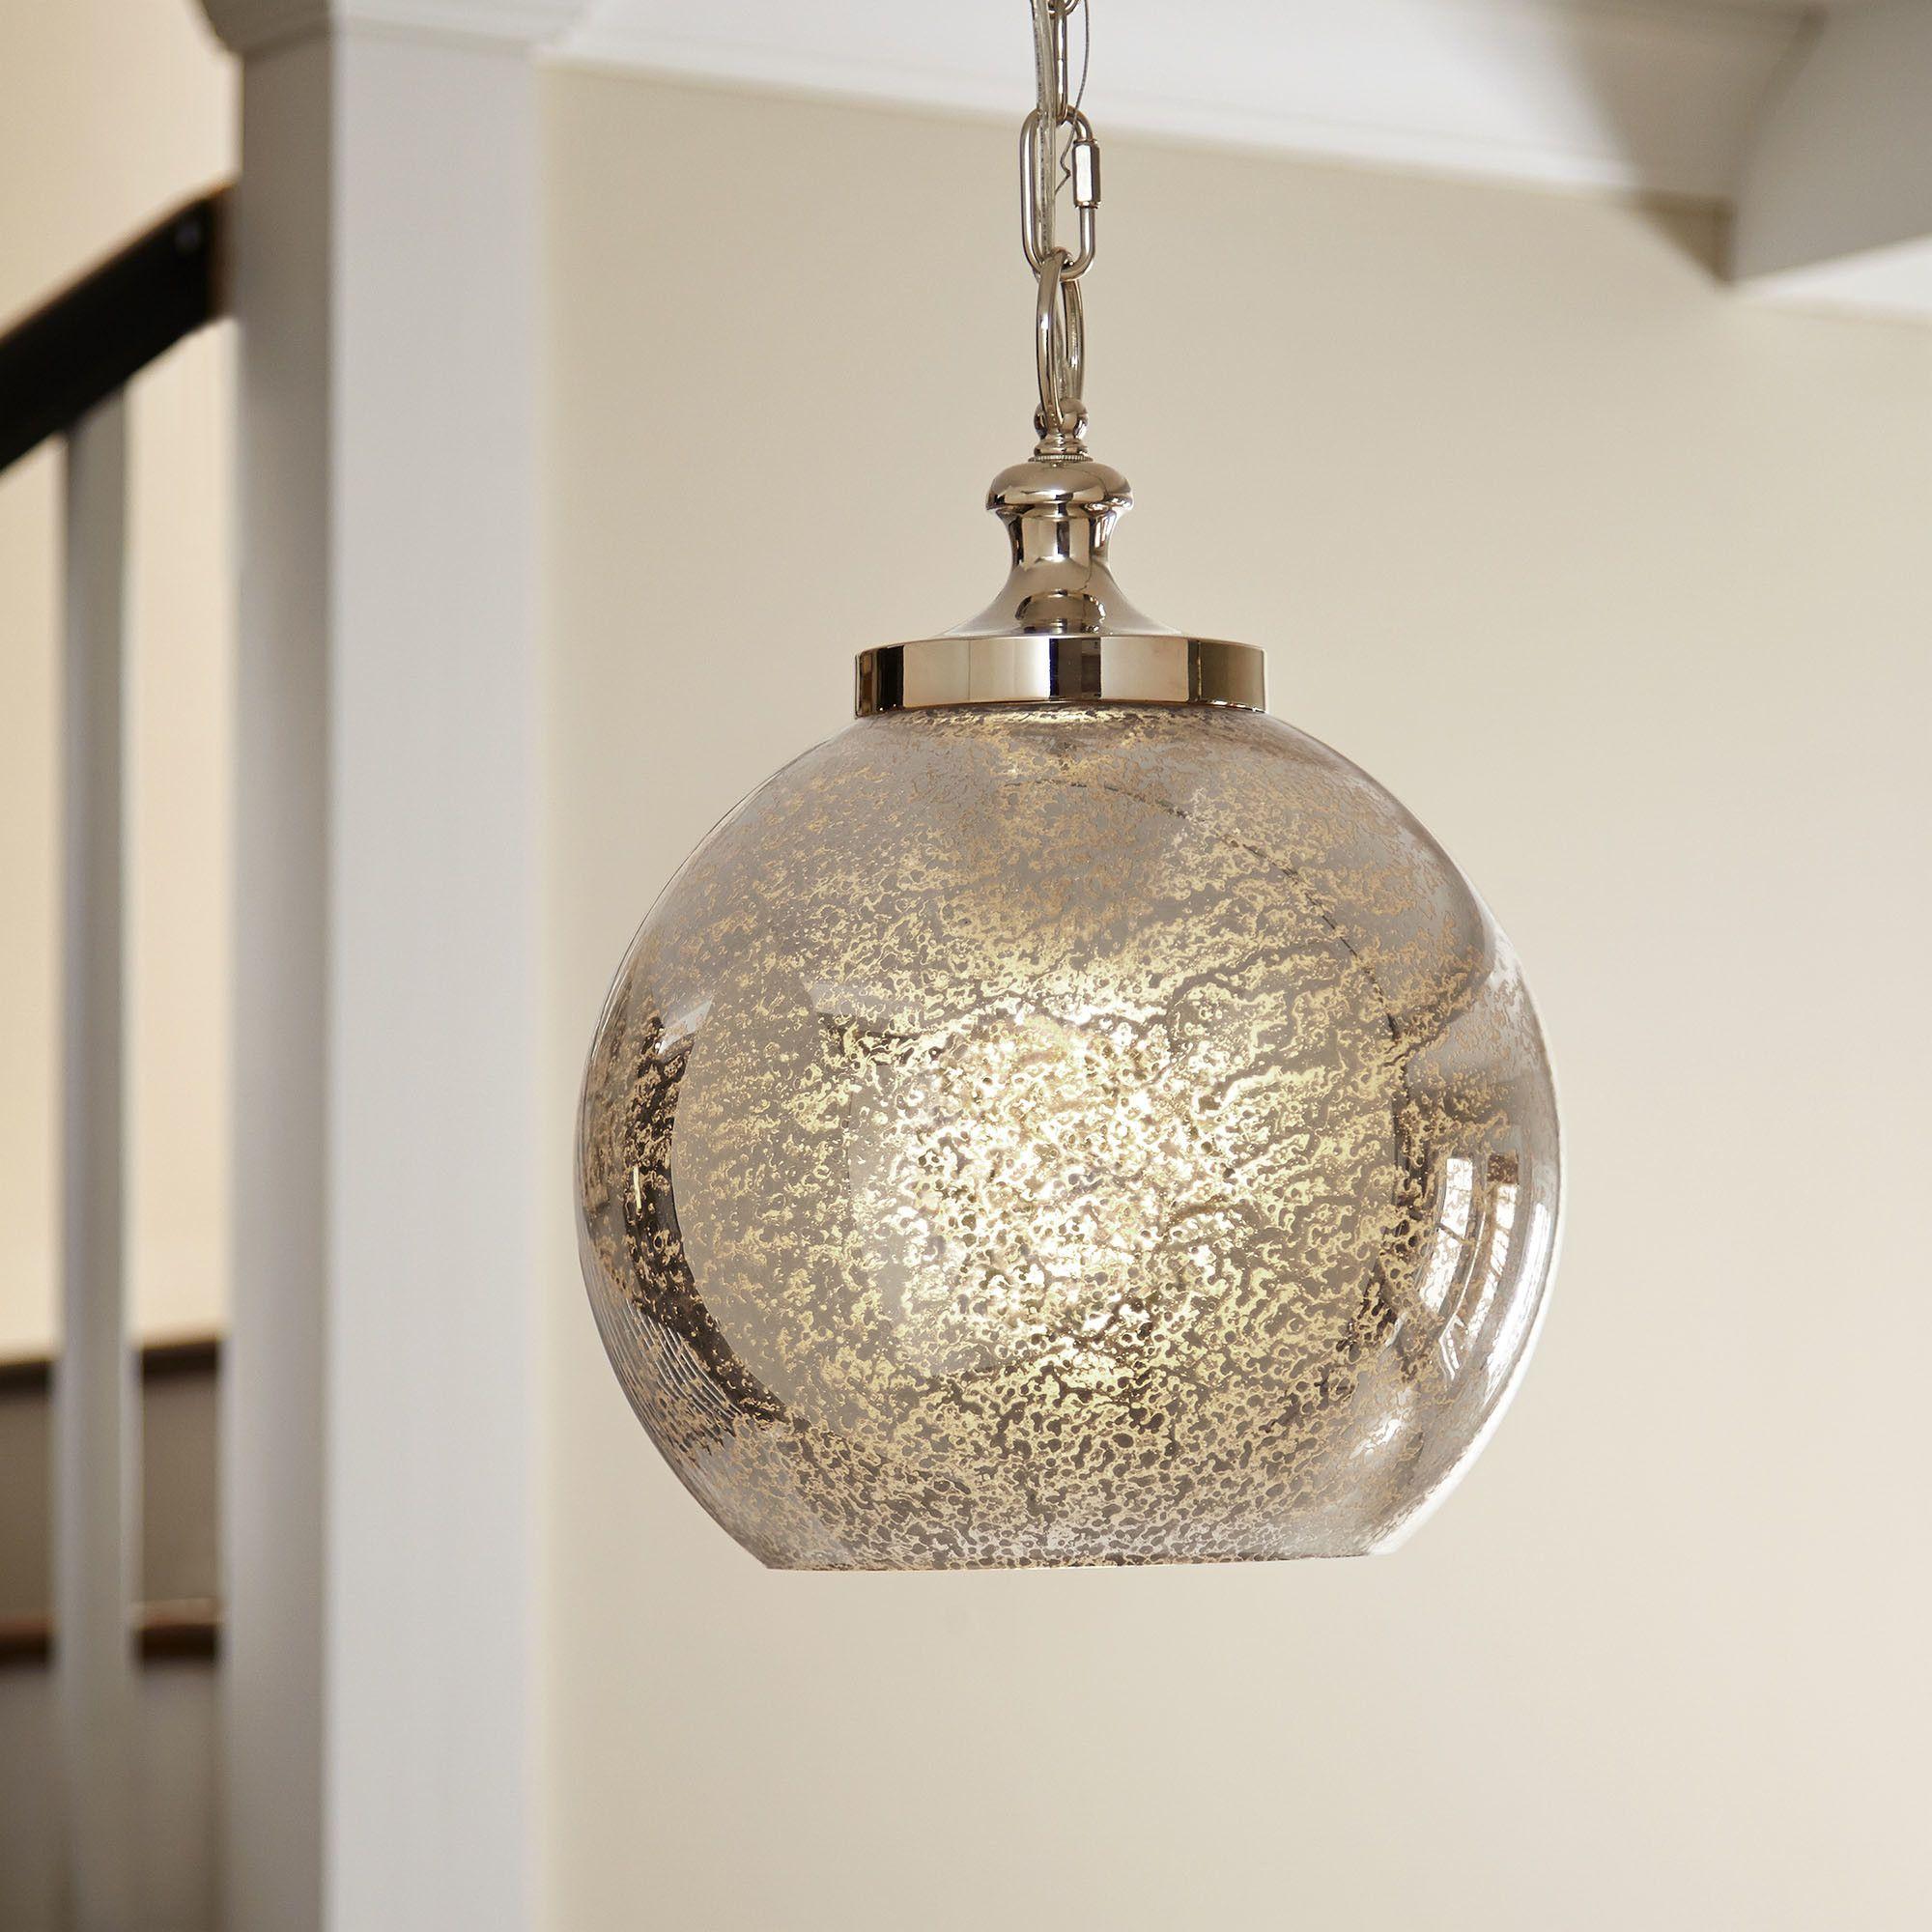 mercury astonishing pendant light colored lights cylinder glass fixtures outstanding